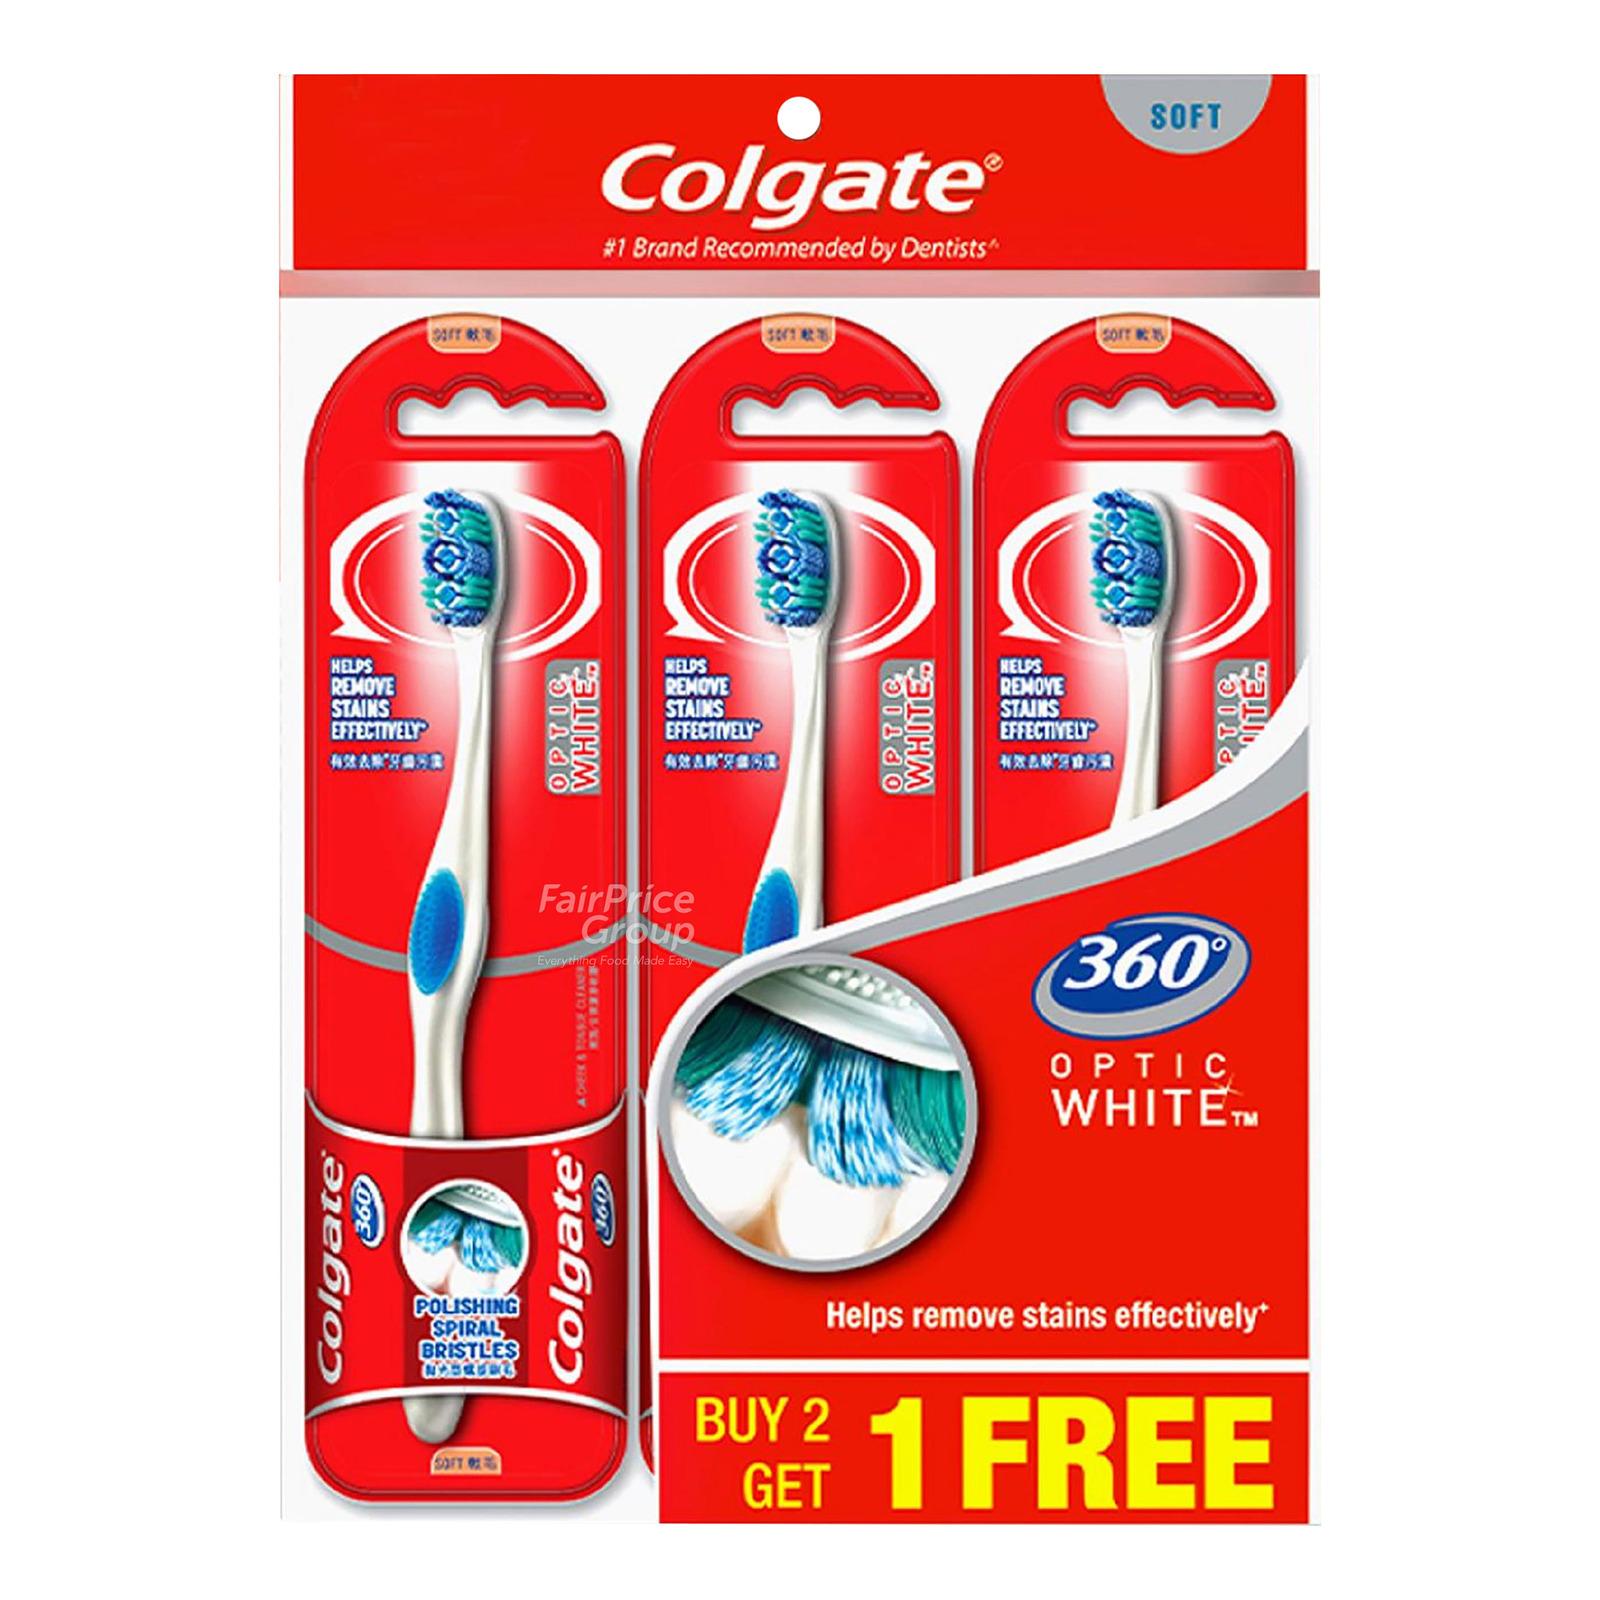 Colgate 360 Optic White Toothbrush - Soft